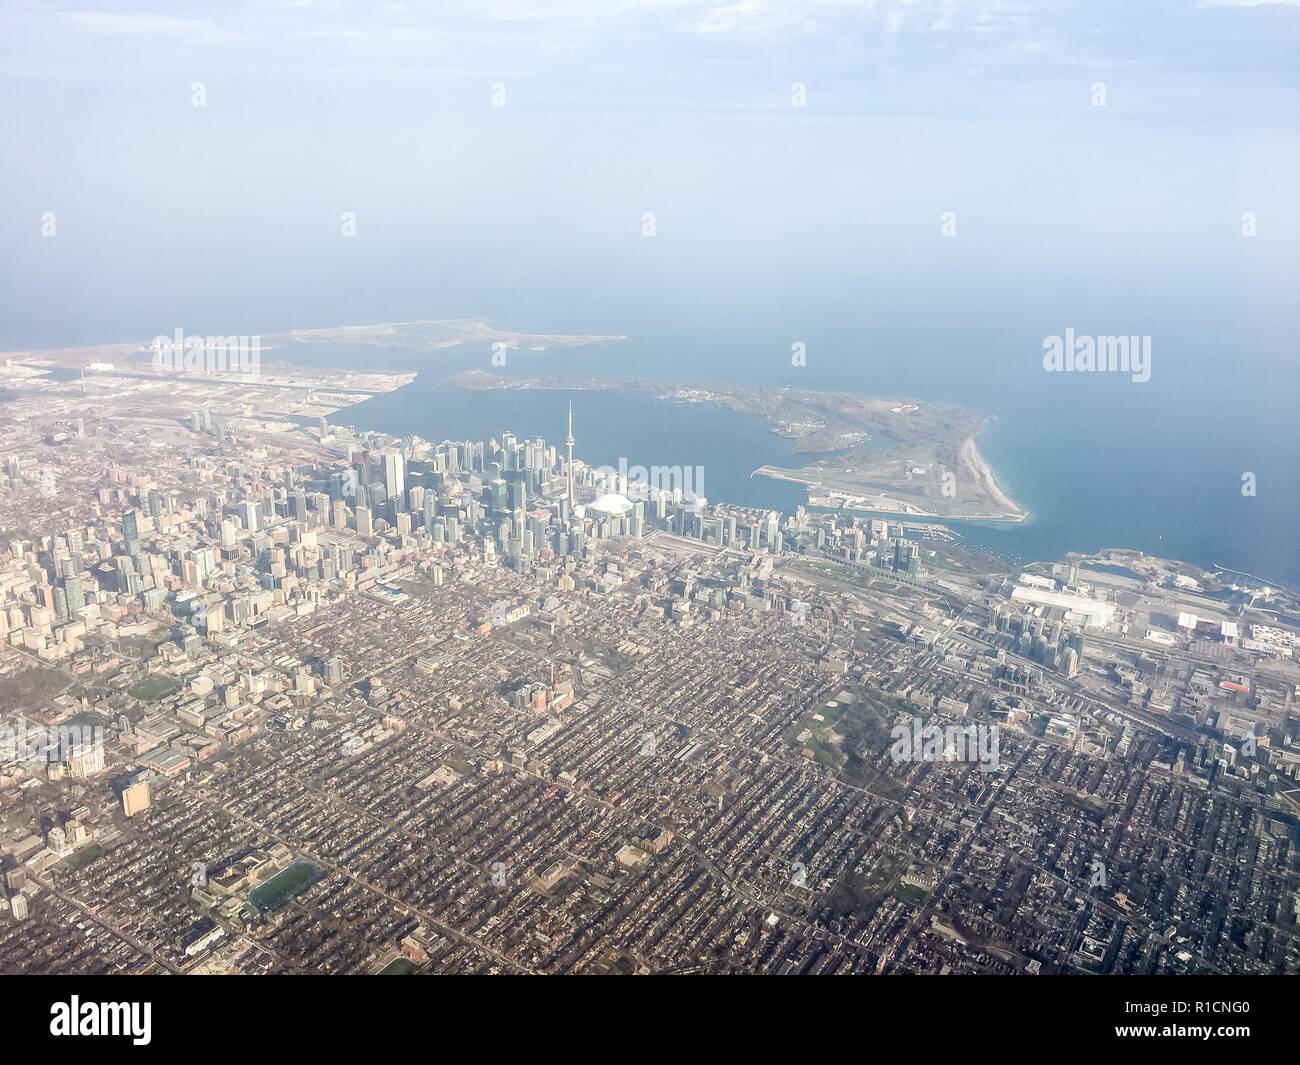 ARIAL VIEW OF TORONTO, ONTARIO, CANADA. - Stock Image